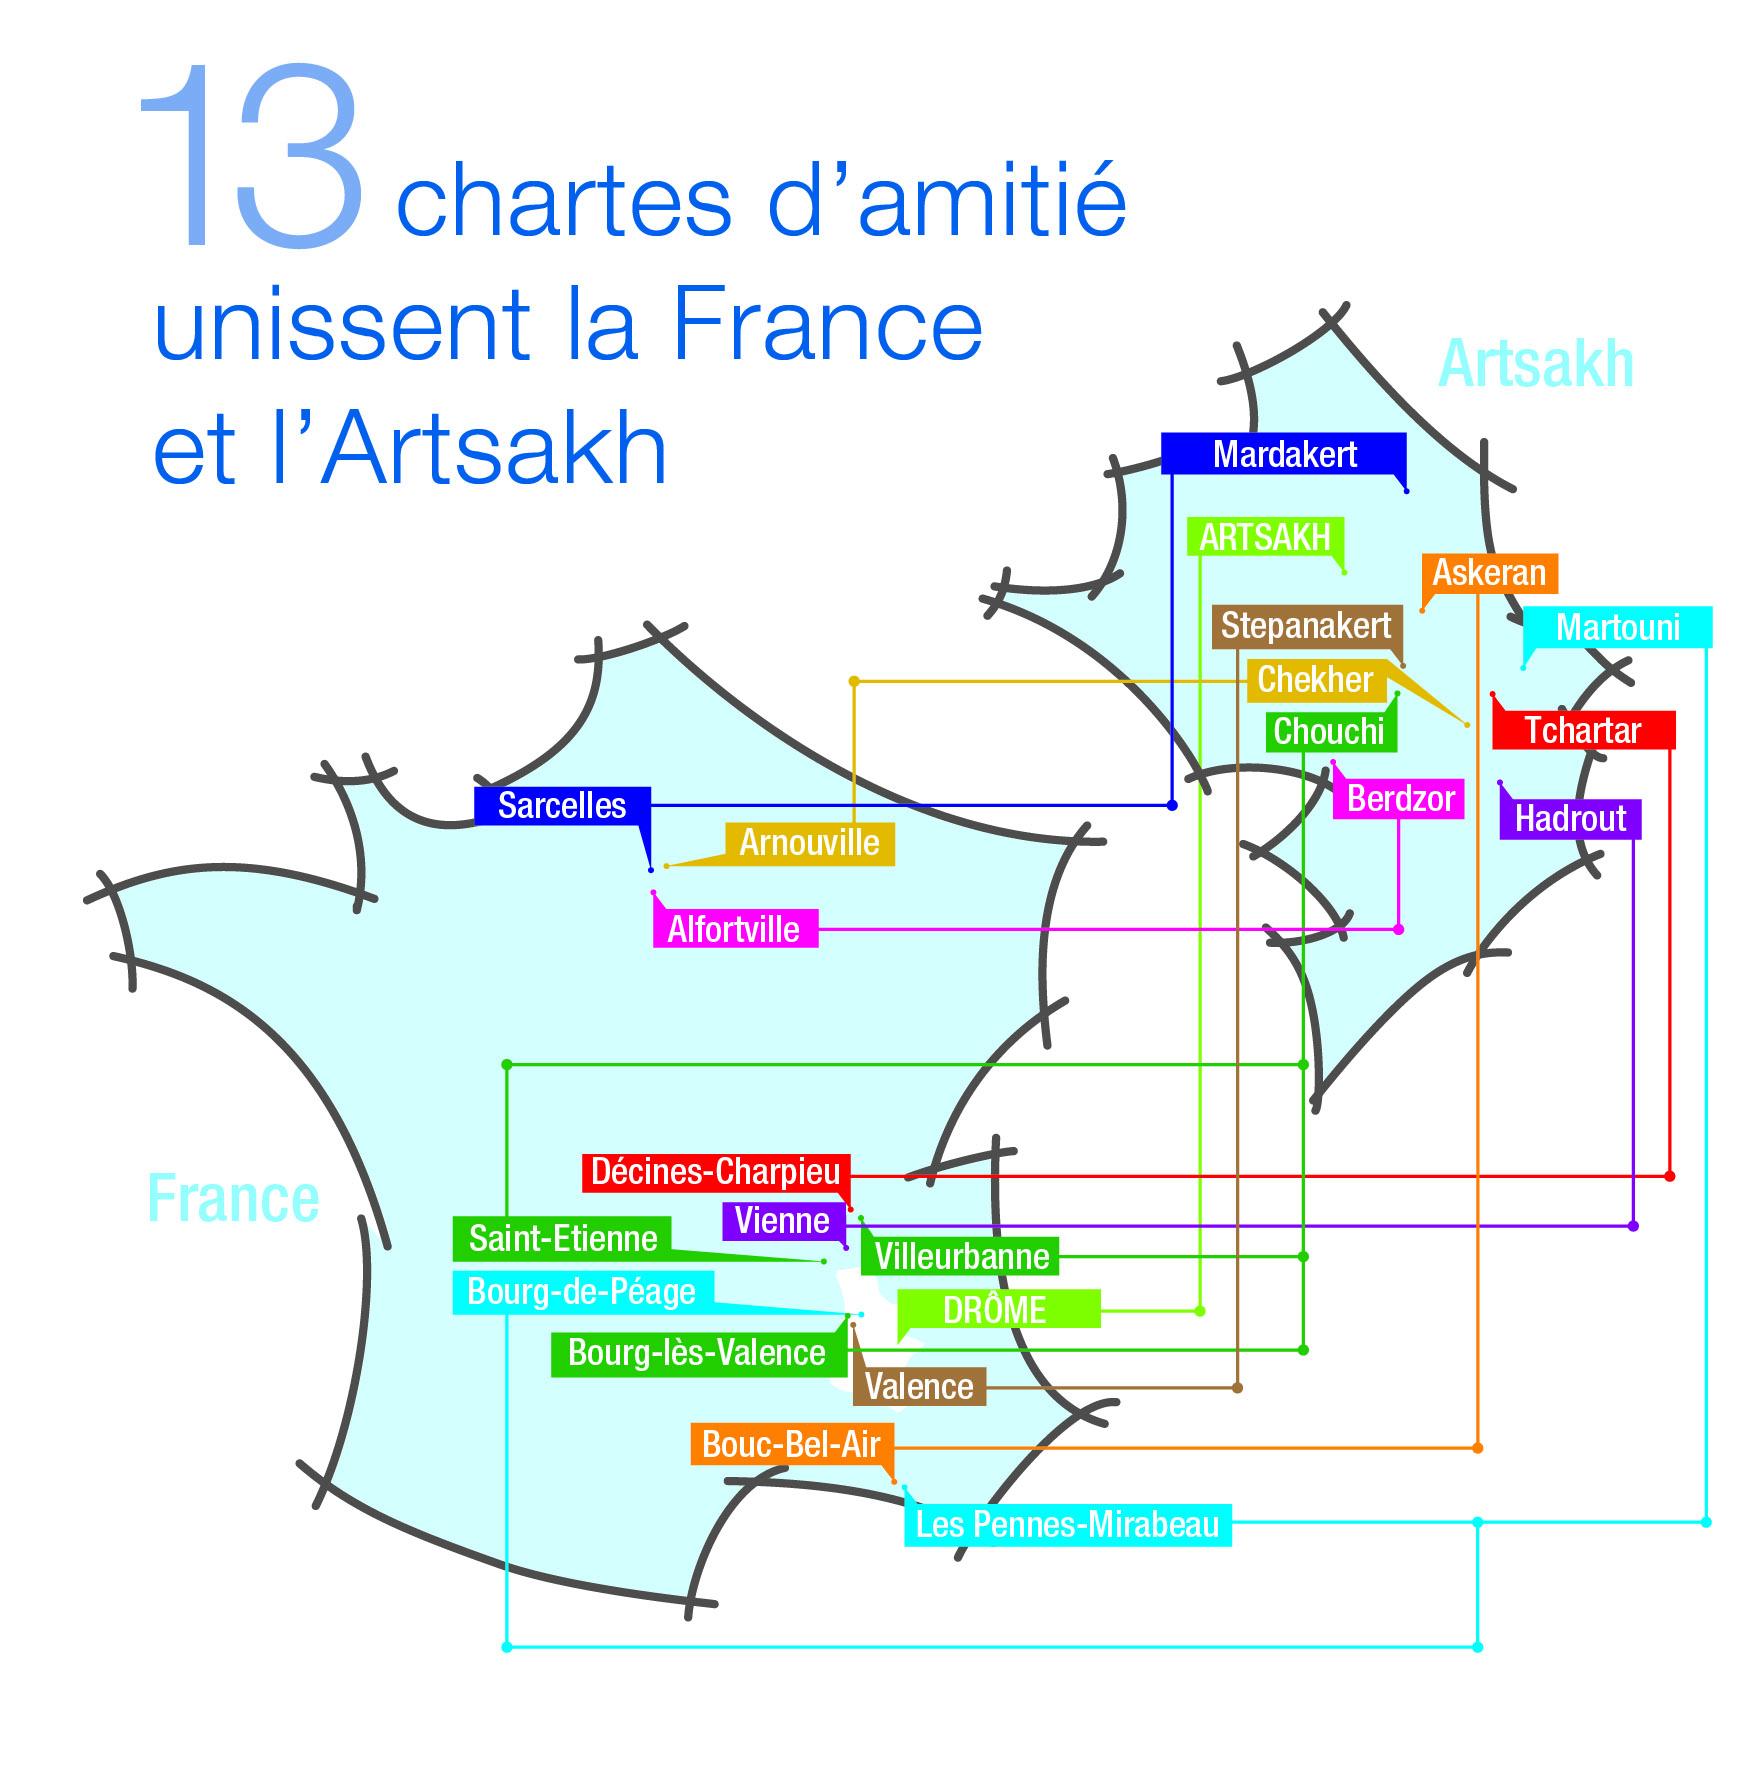 https://laregledujeu.org/files/2019/07/13-chartes-d-amitie-entre-la-france-et-l-artsakh.jpg